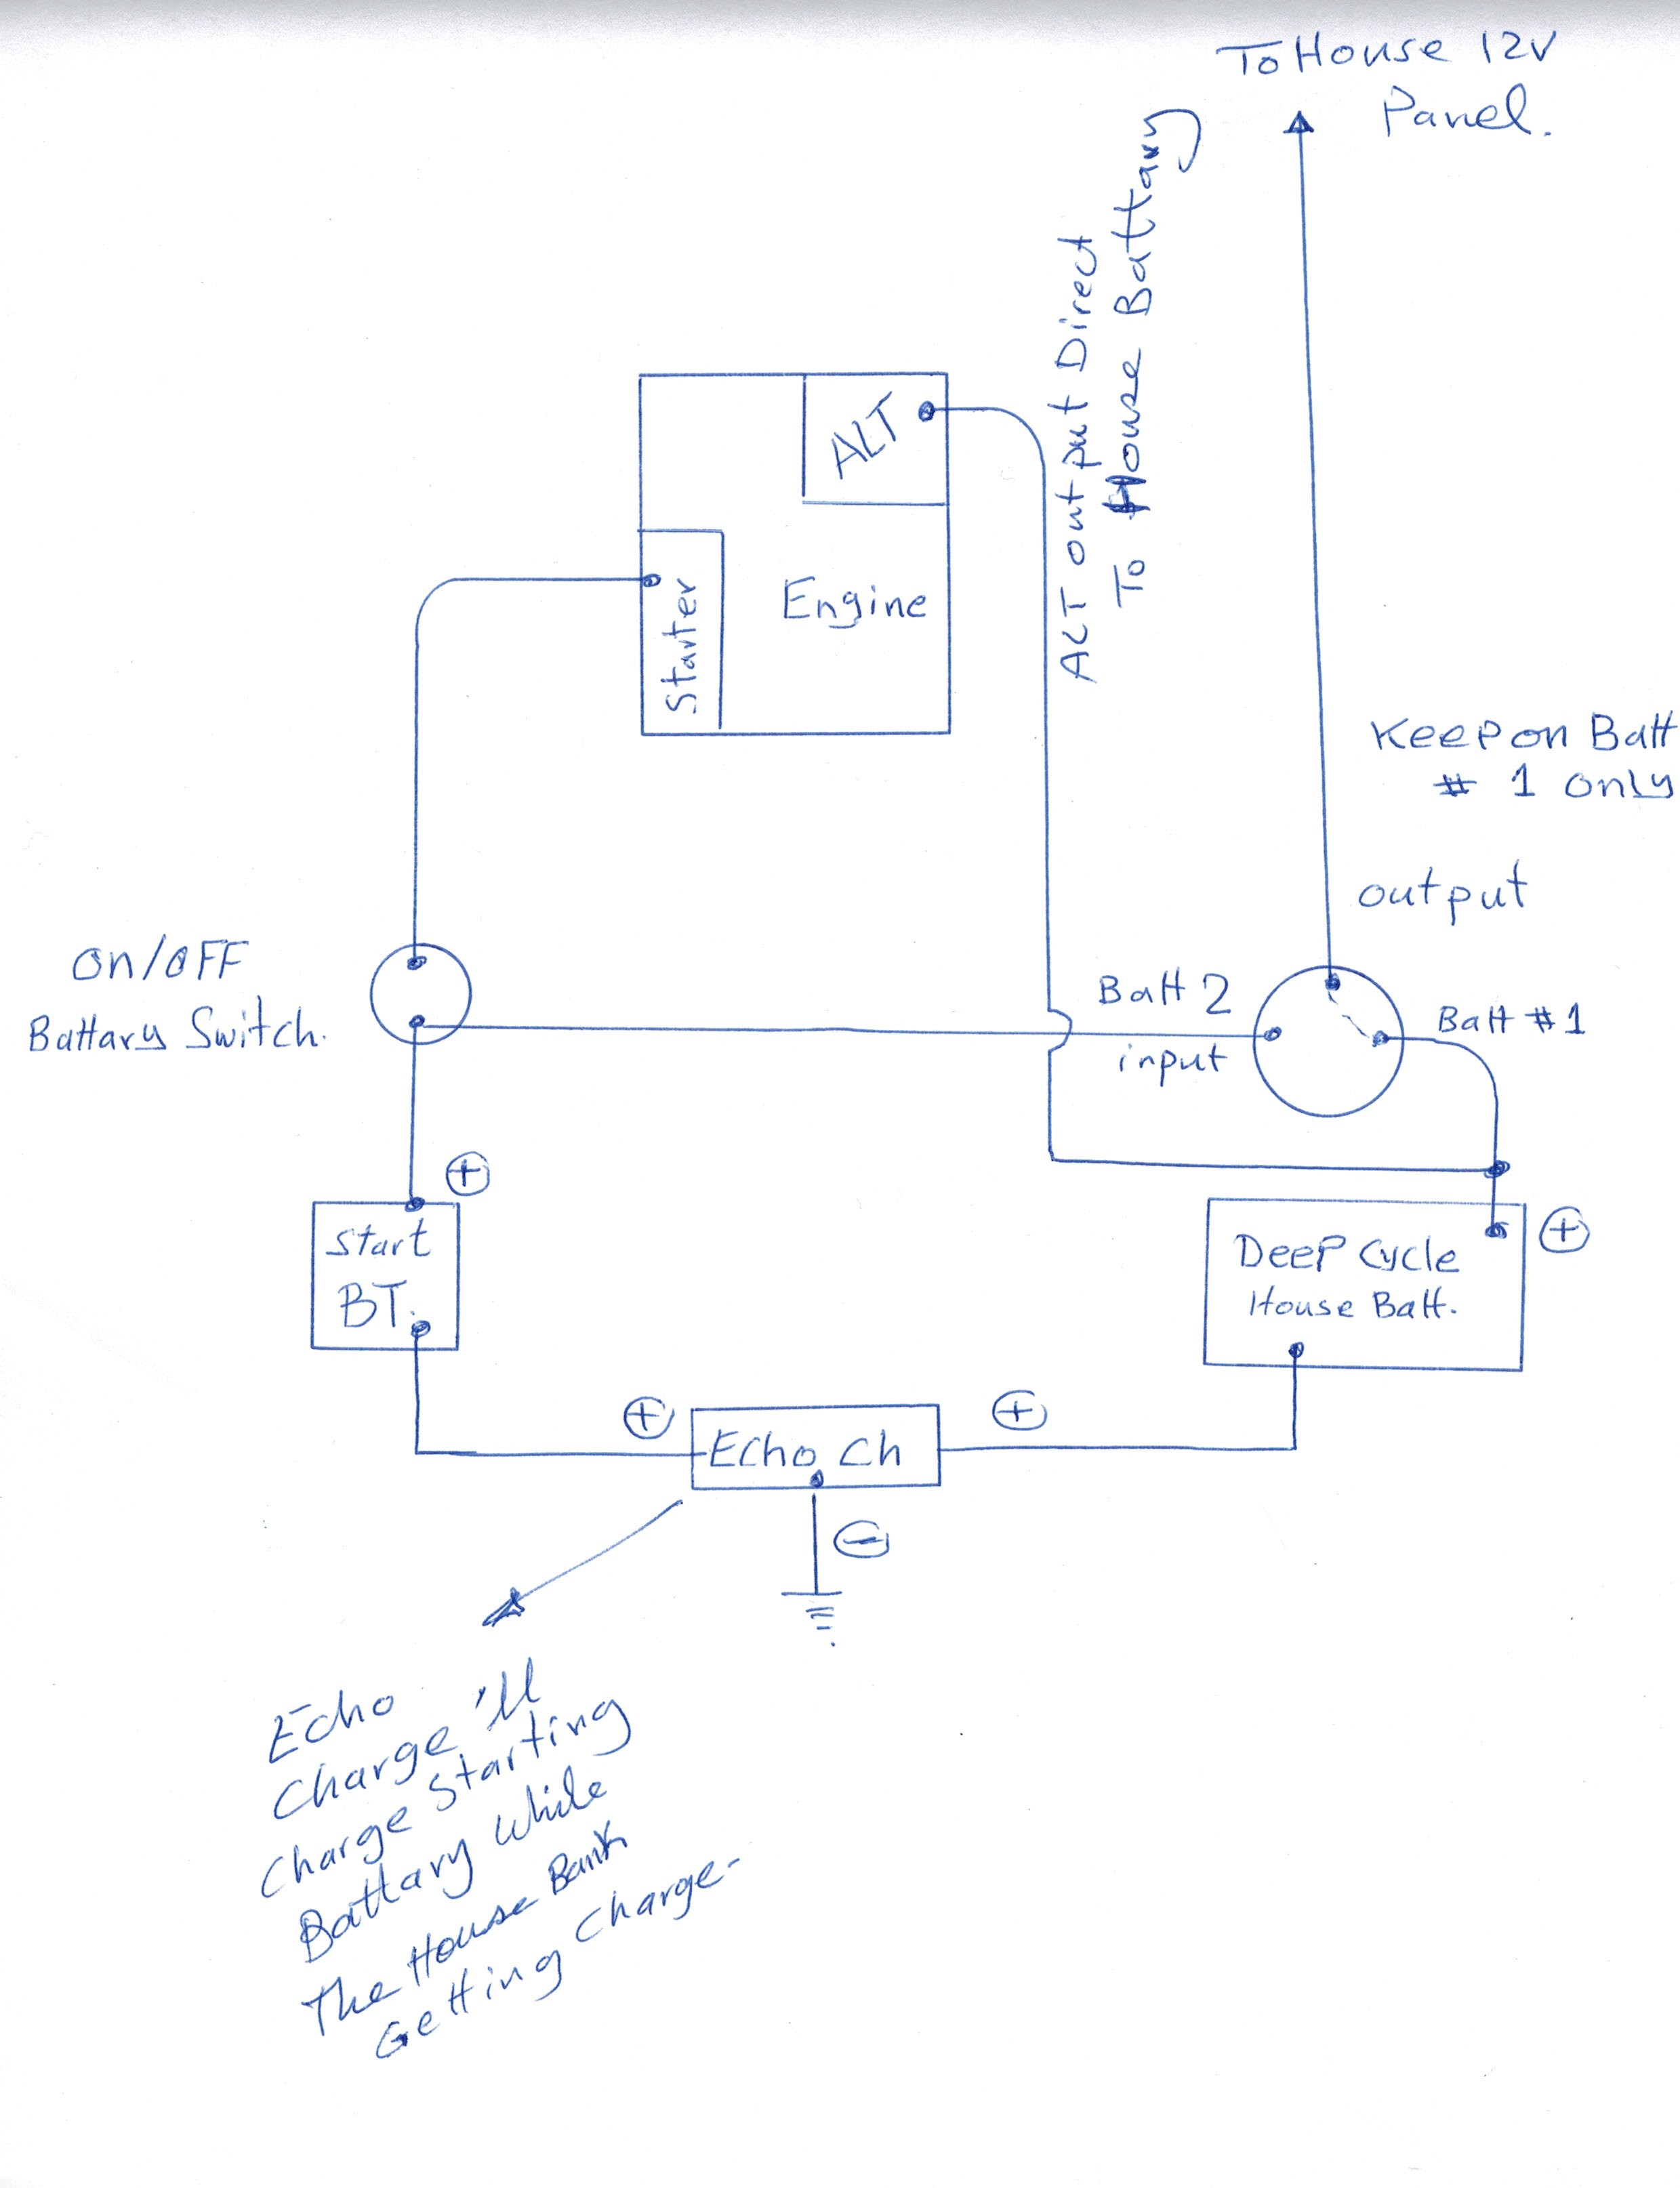 Landscape Lighting Wiring Instructions Diagram For Boat Lights The